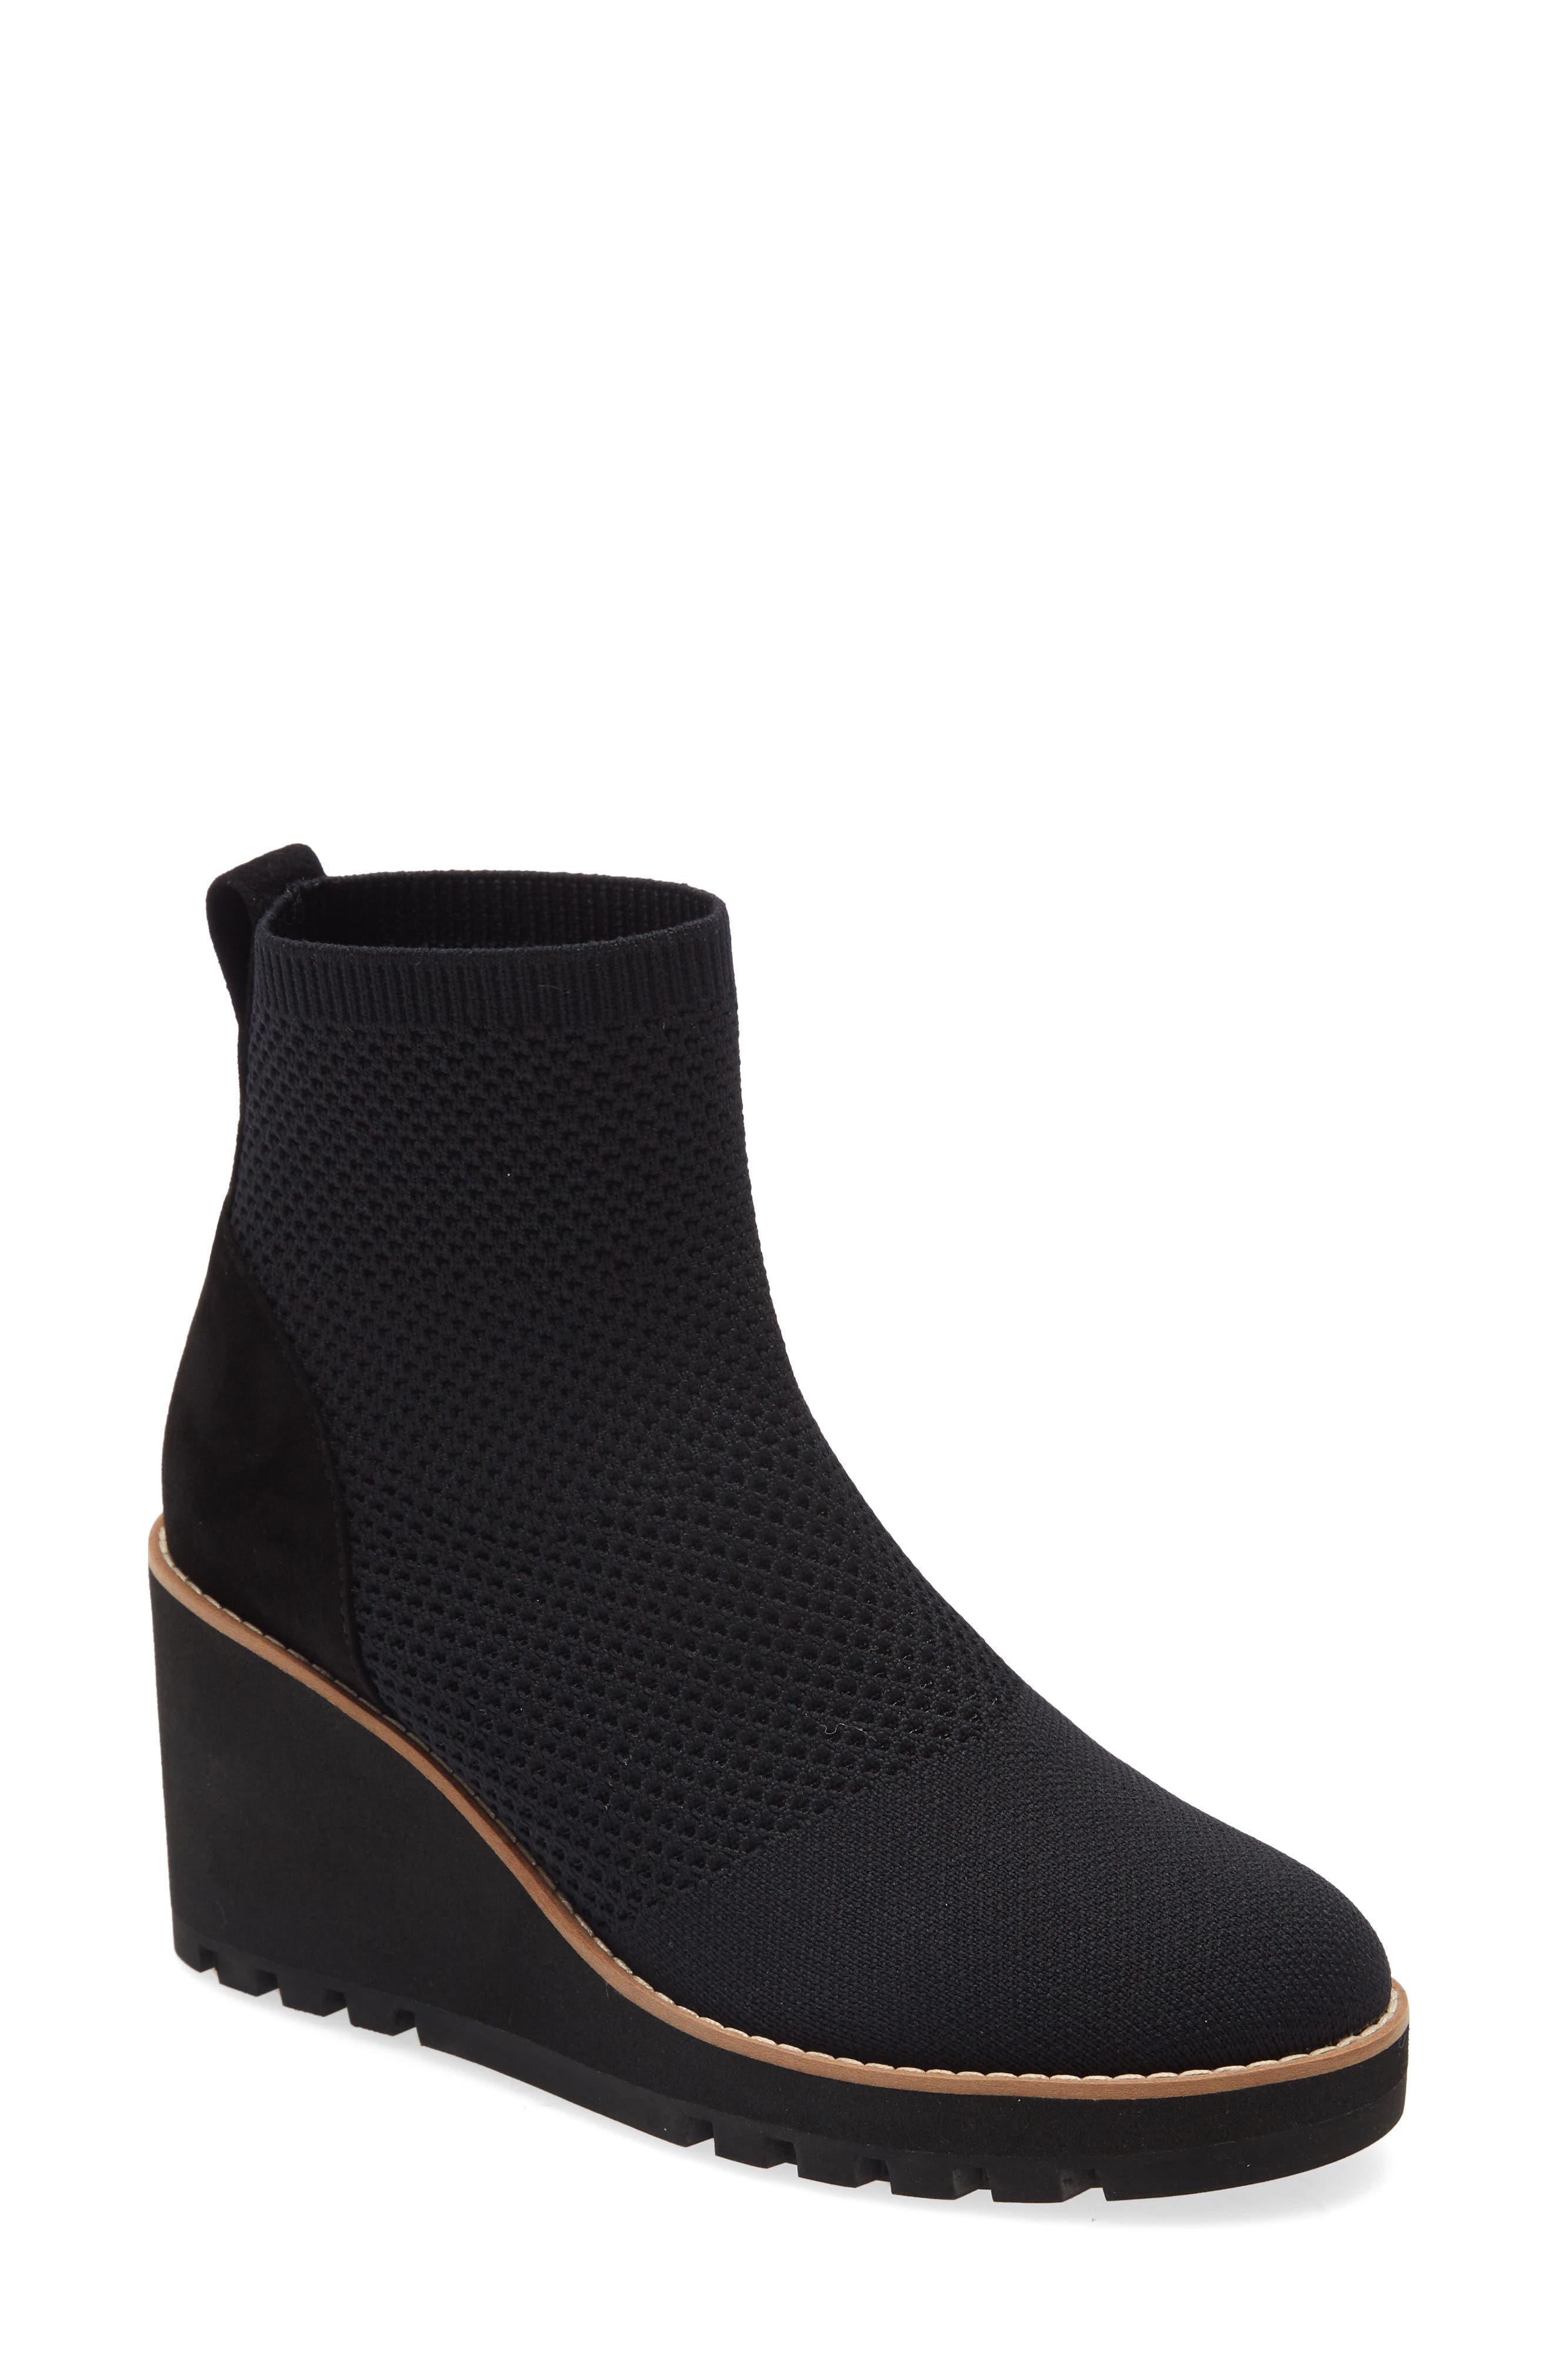 Women's Eileen Fisher Shoes   Nordstrom